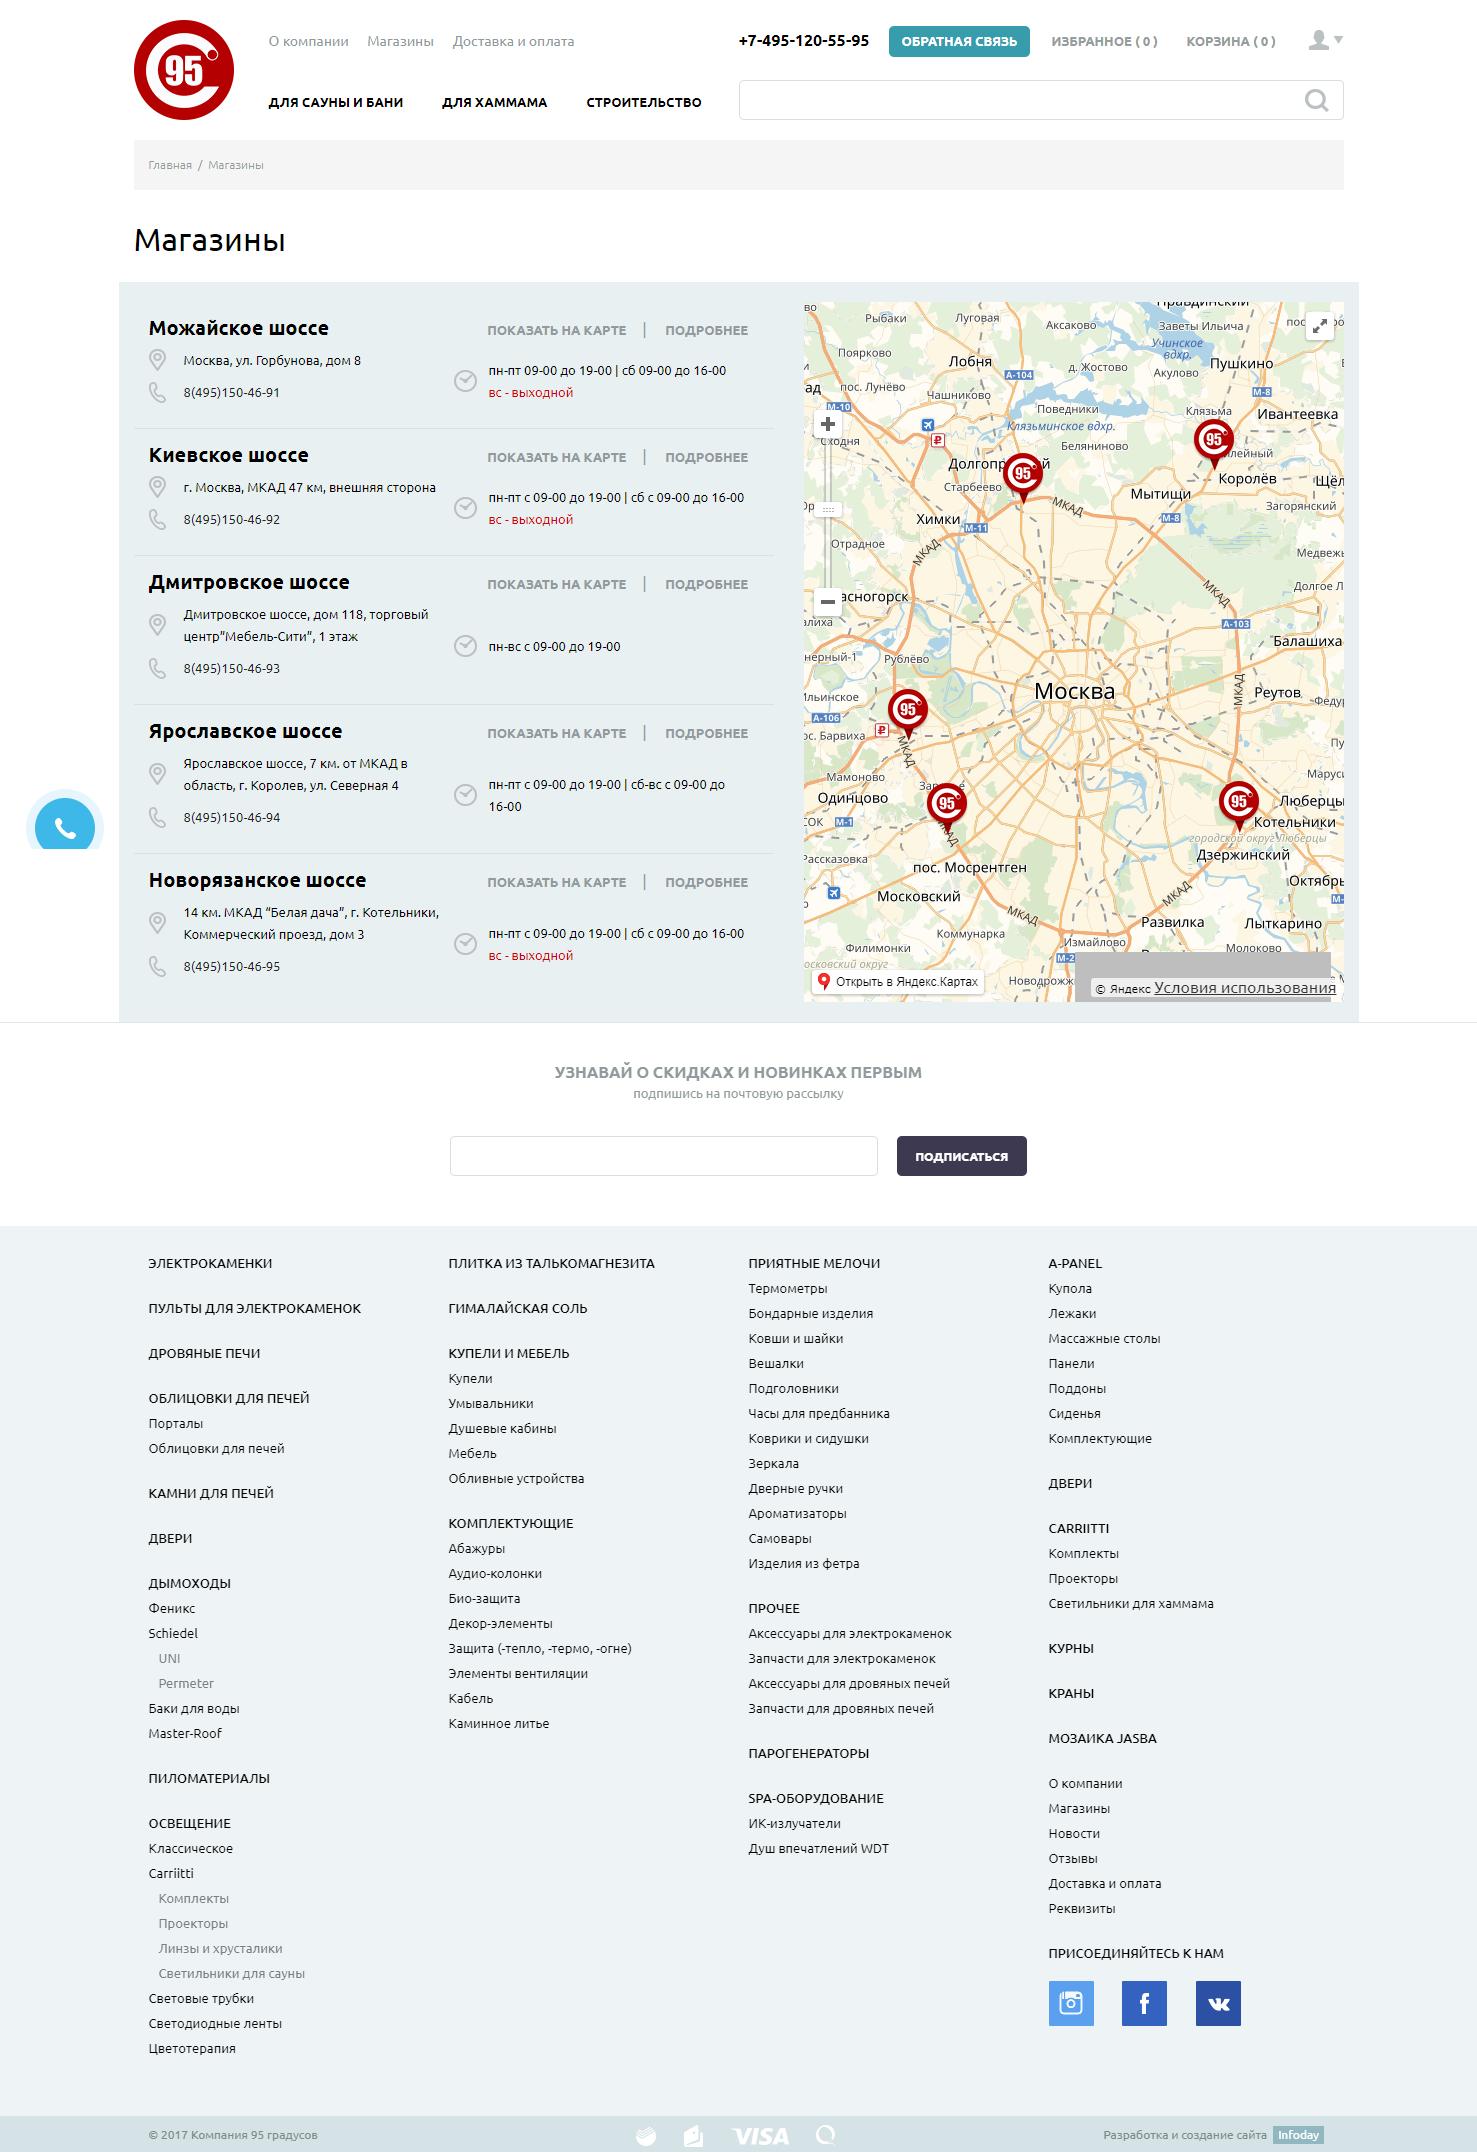 95c.ru - интернет магазин